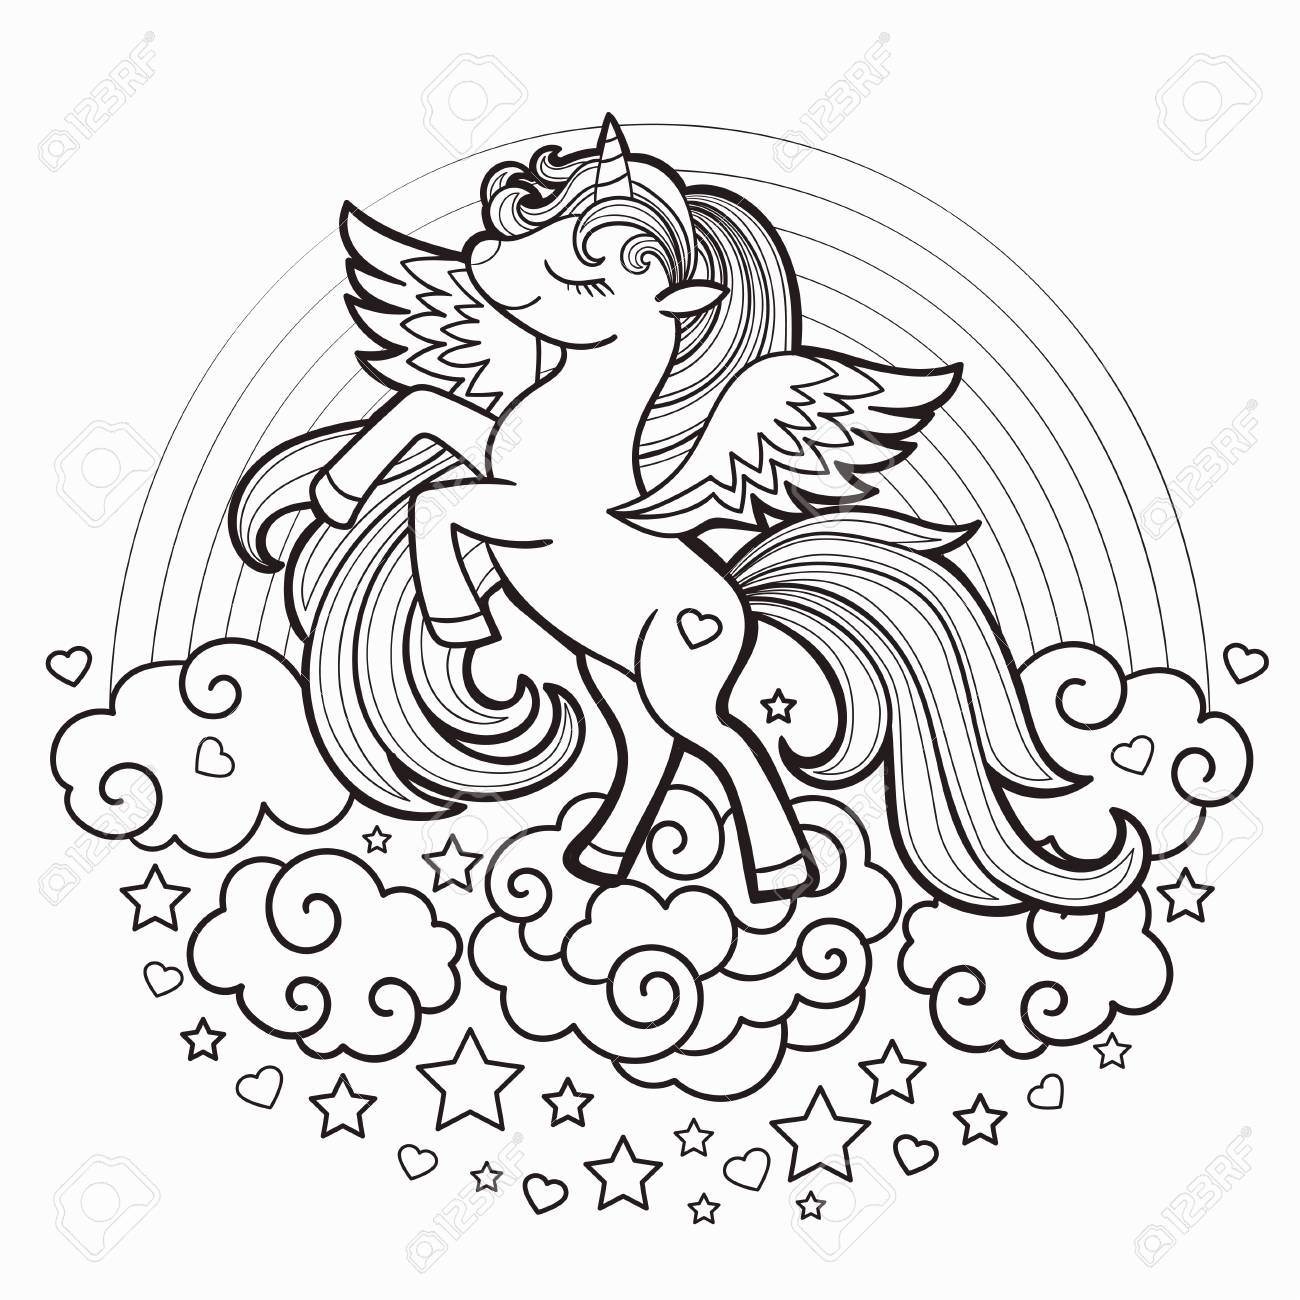 Cute Rainbow Unicorn. Black And White. Vector Illustration For